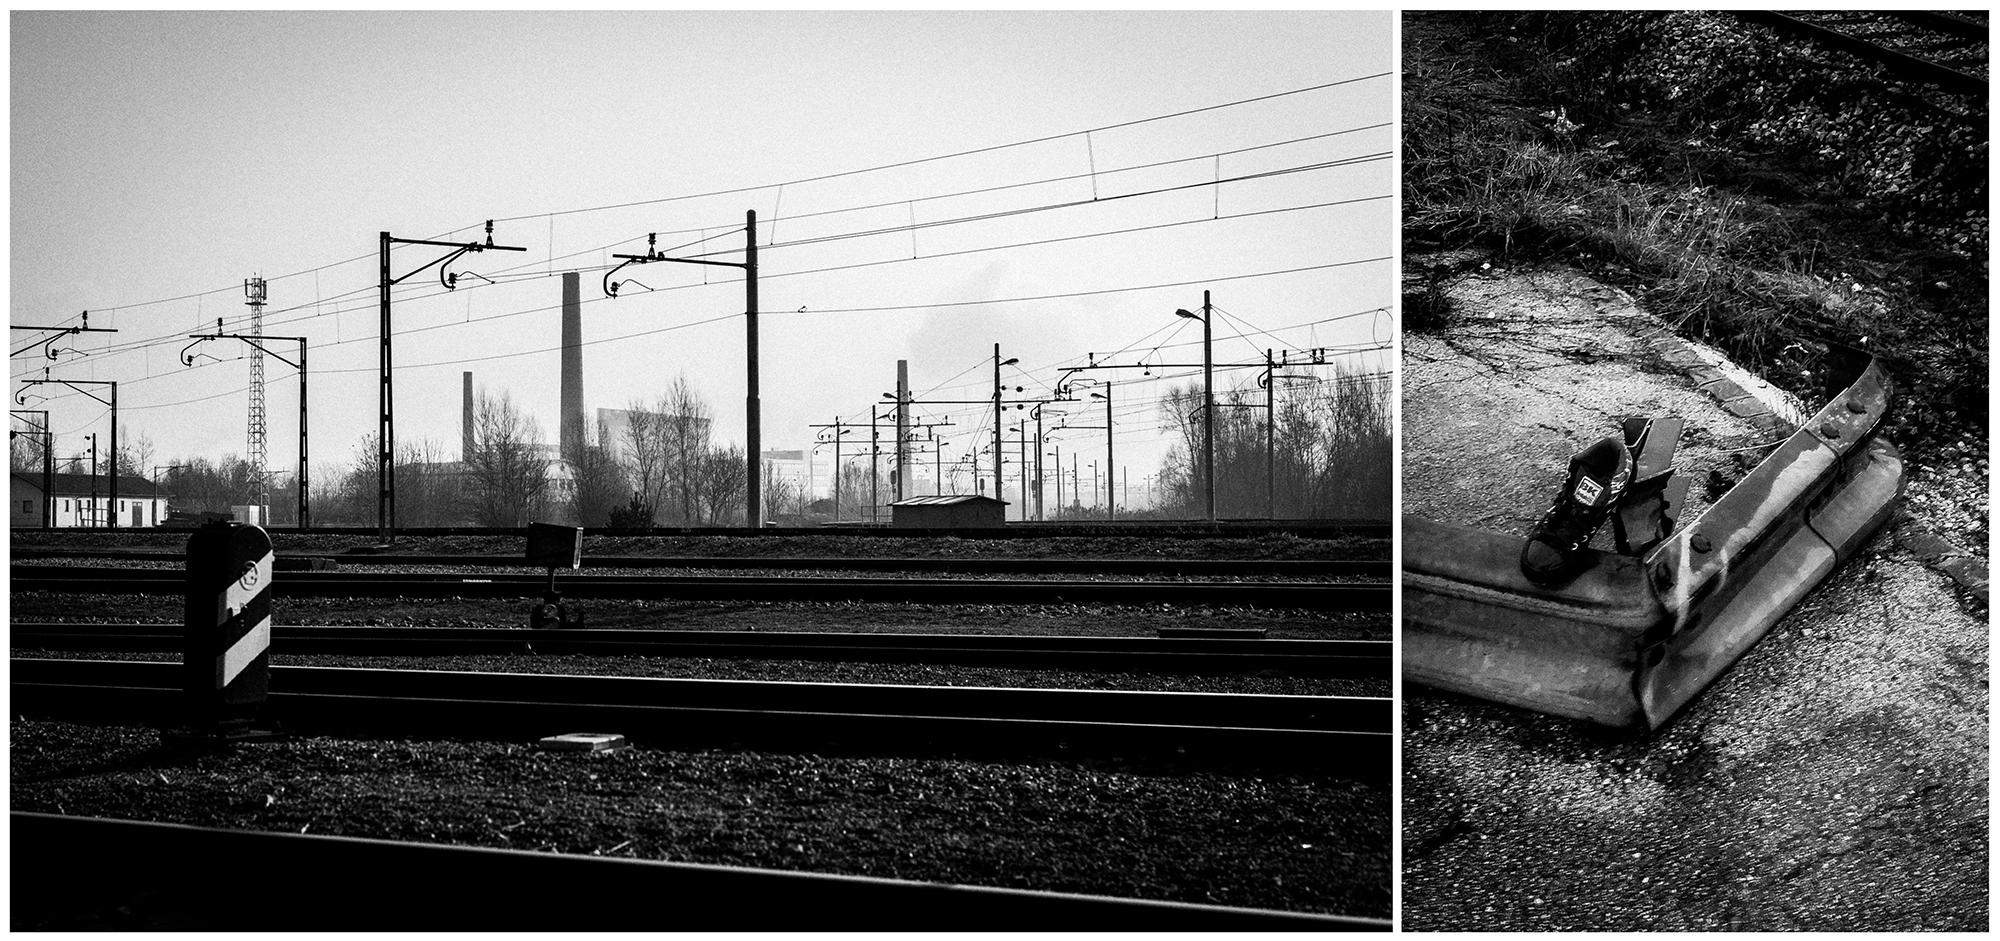 Miro Nunic_Runaway train